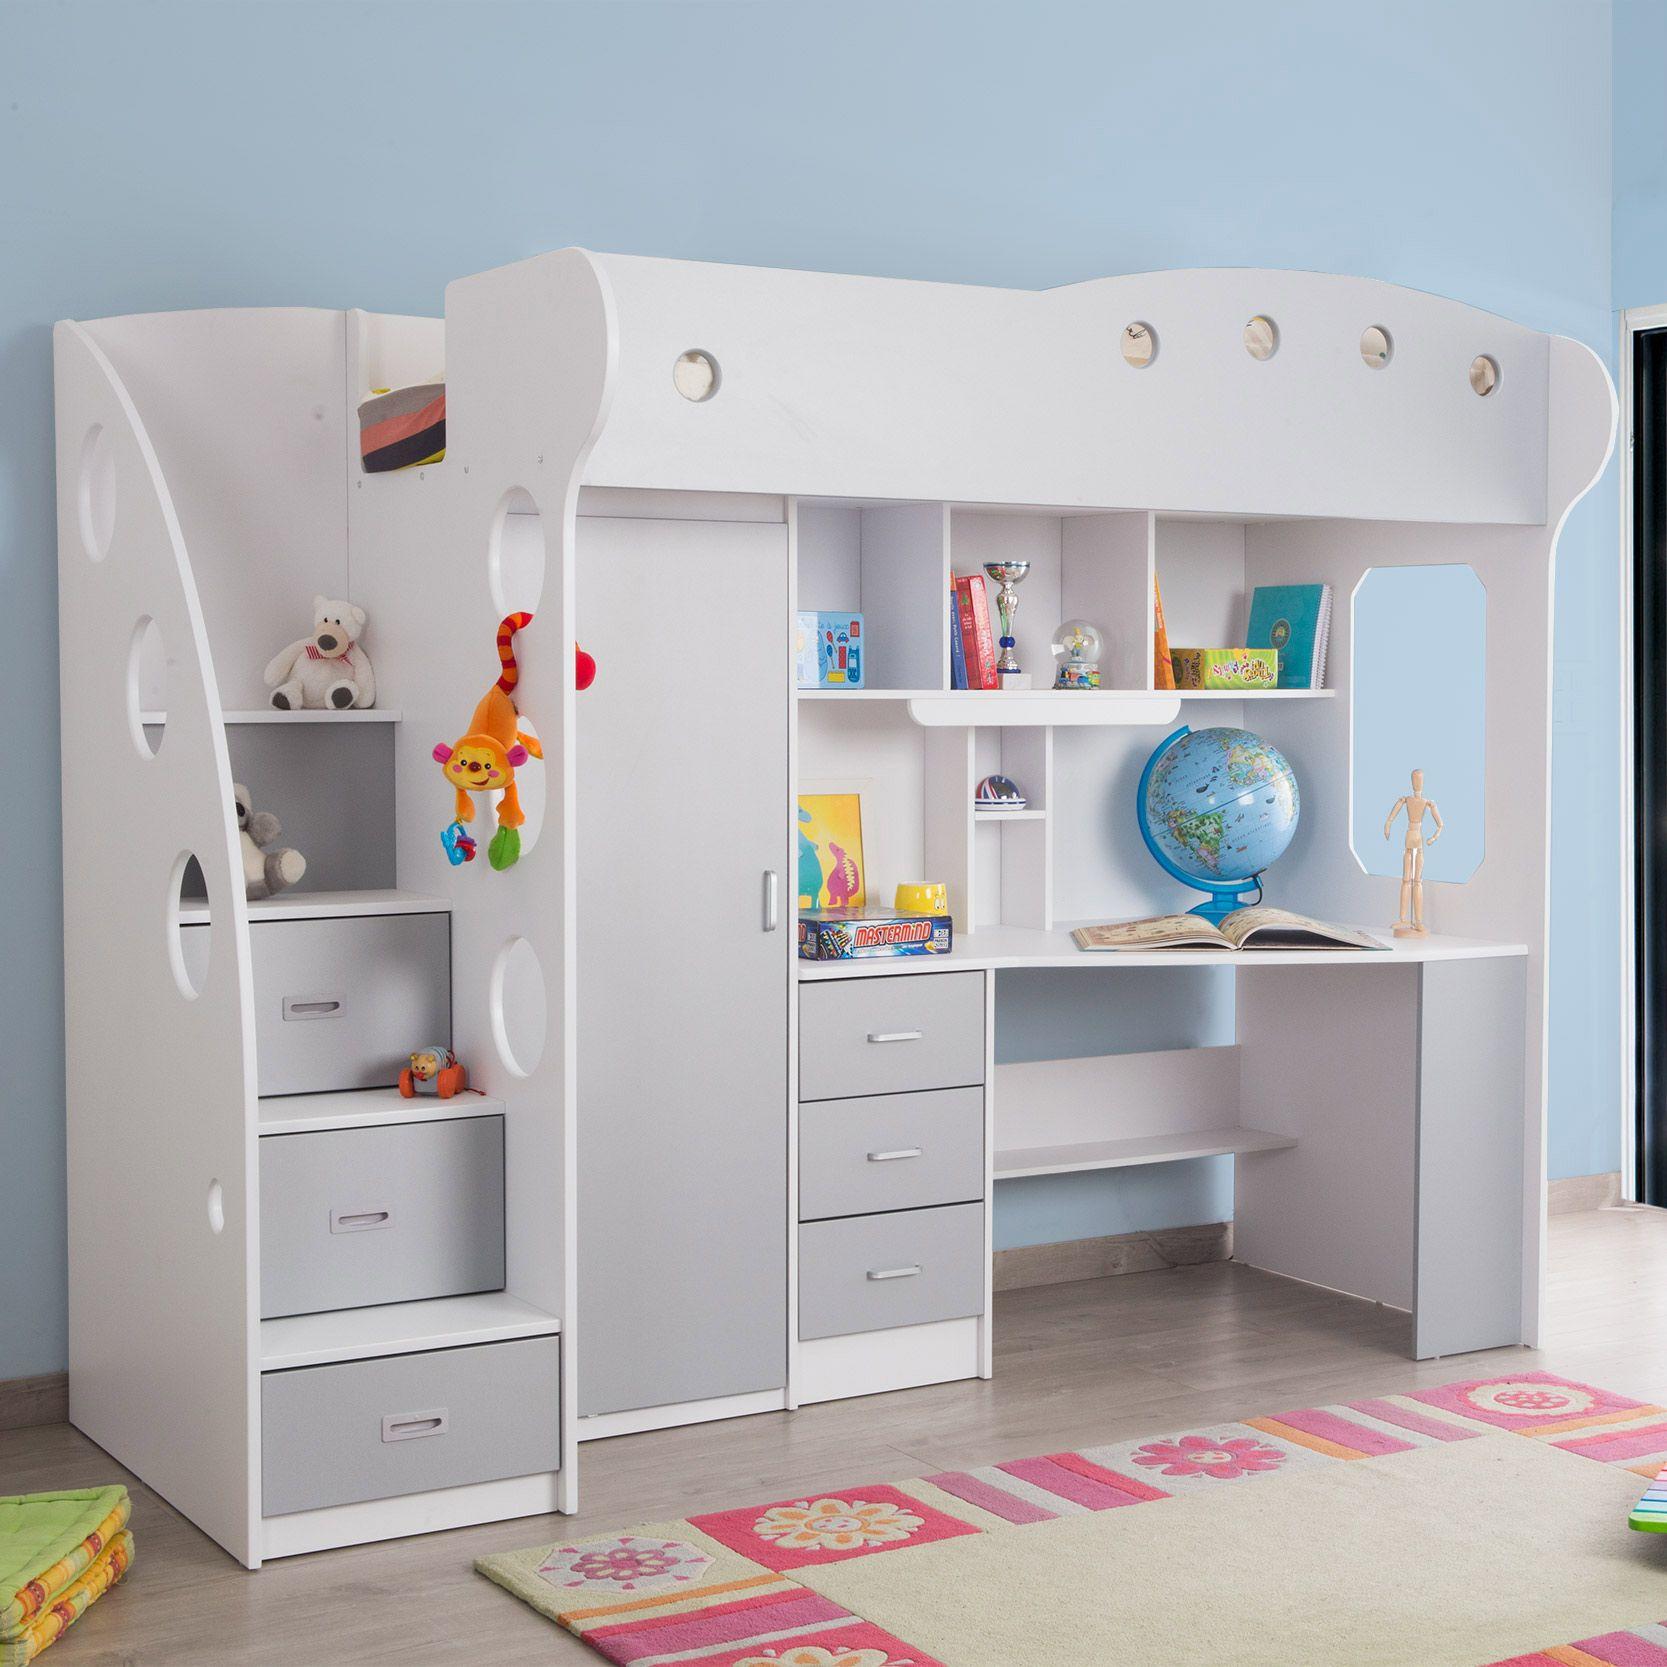 Lit Combine Avec Bureau Et Rangement Couchage 90x190 Cm Cama Y Escritorio Muebles Habitacion Ideas De Cama